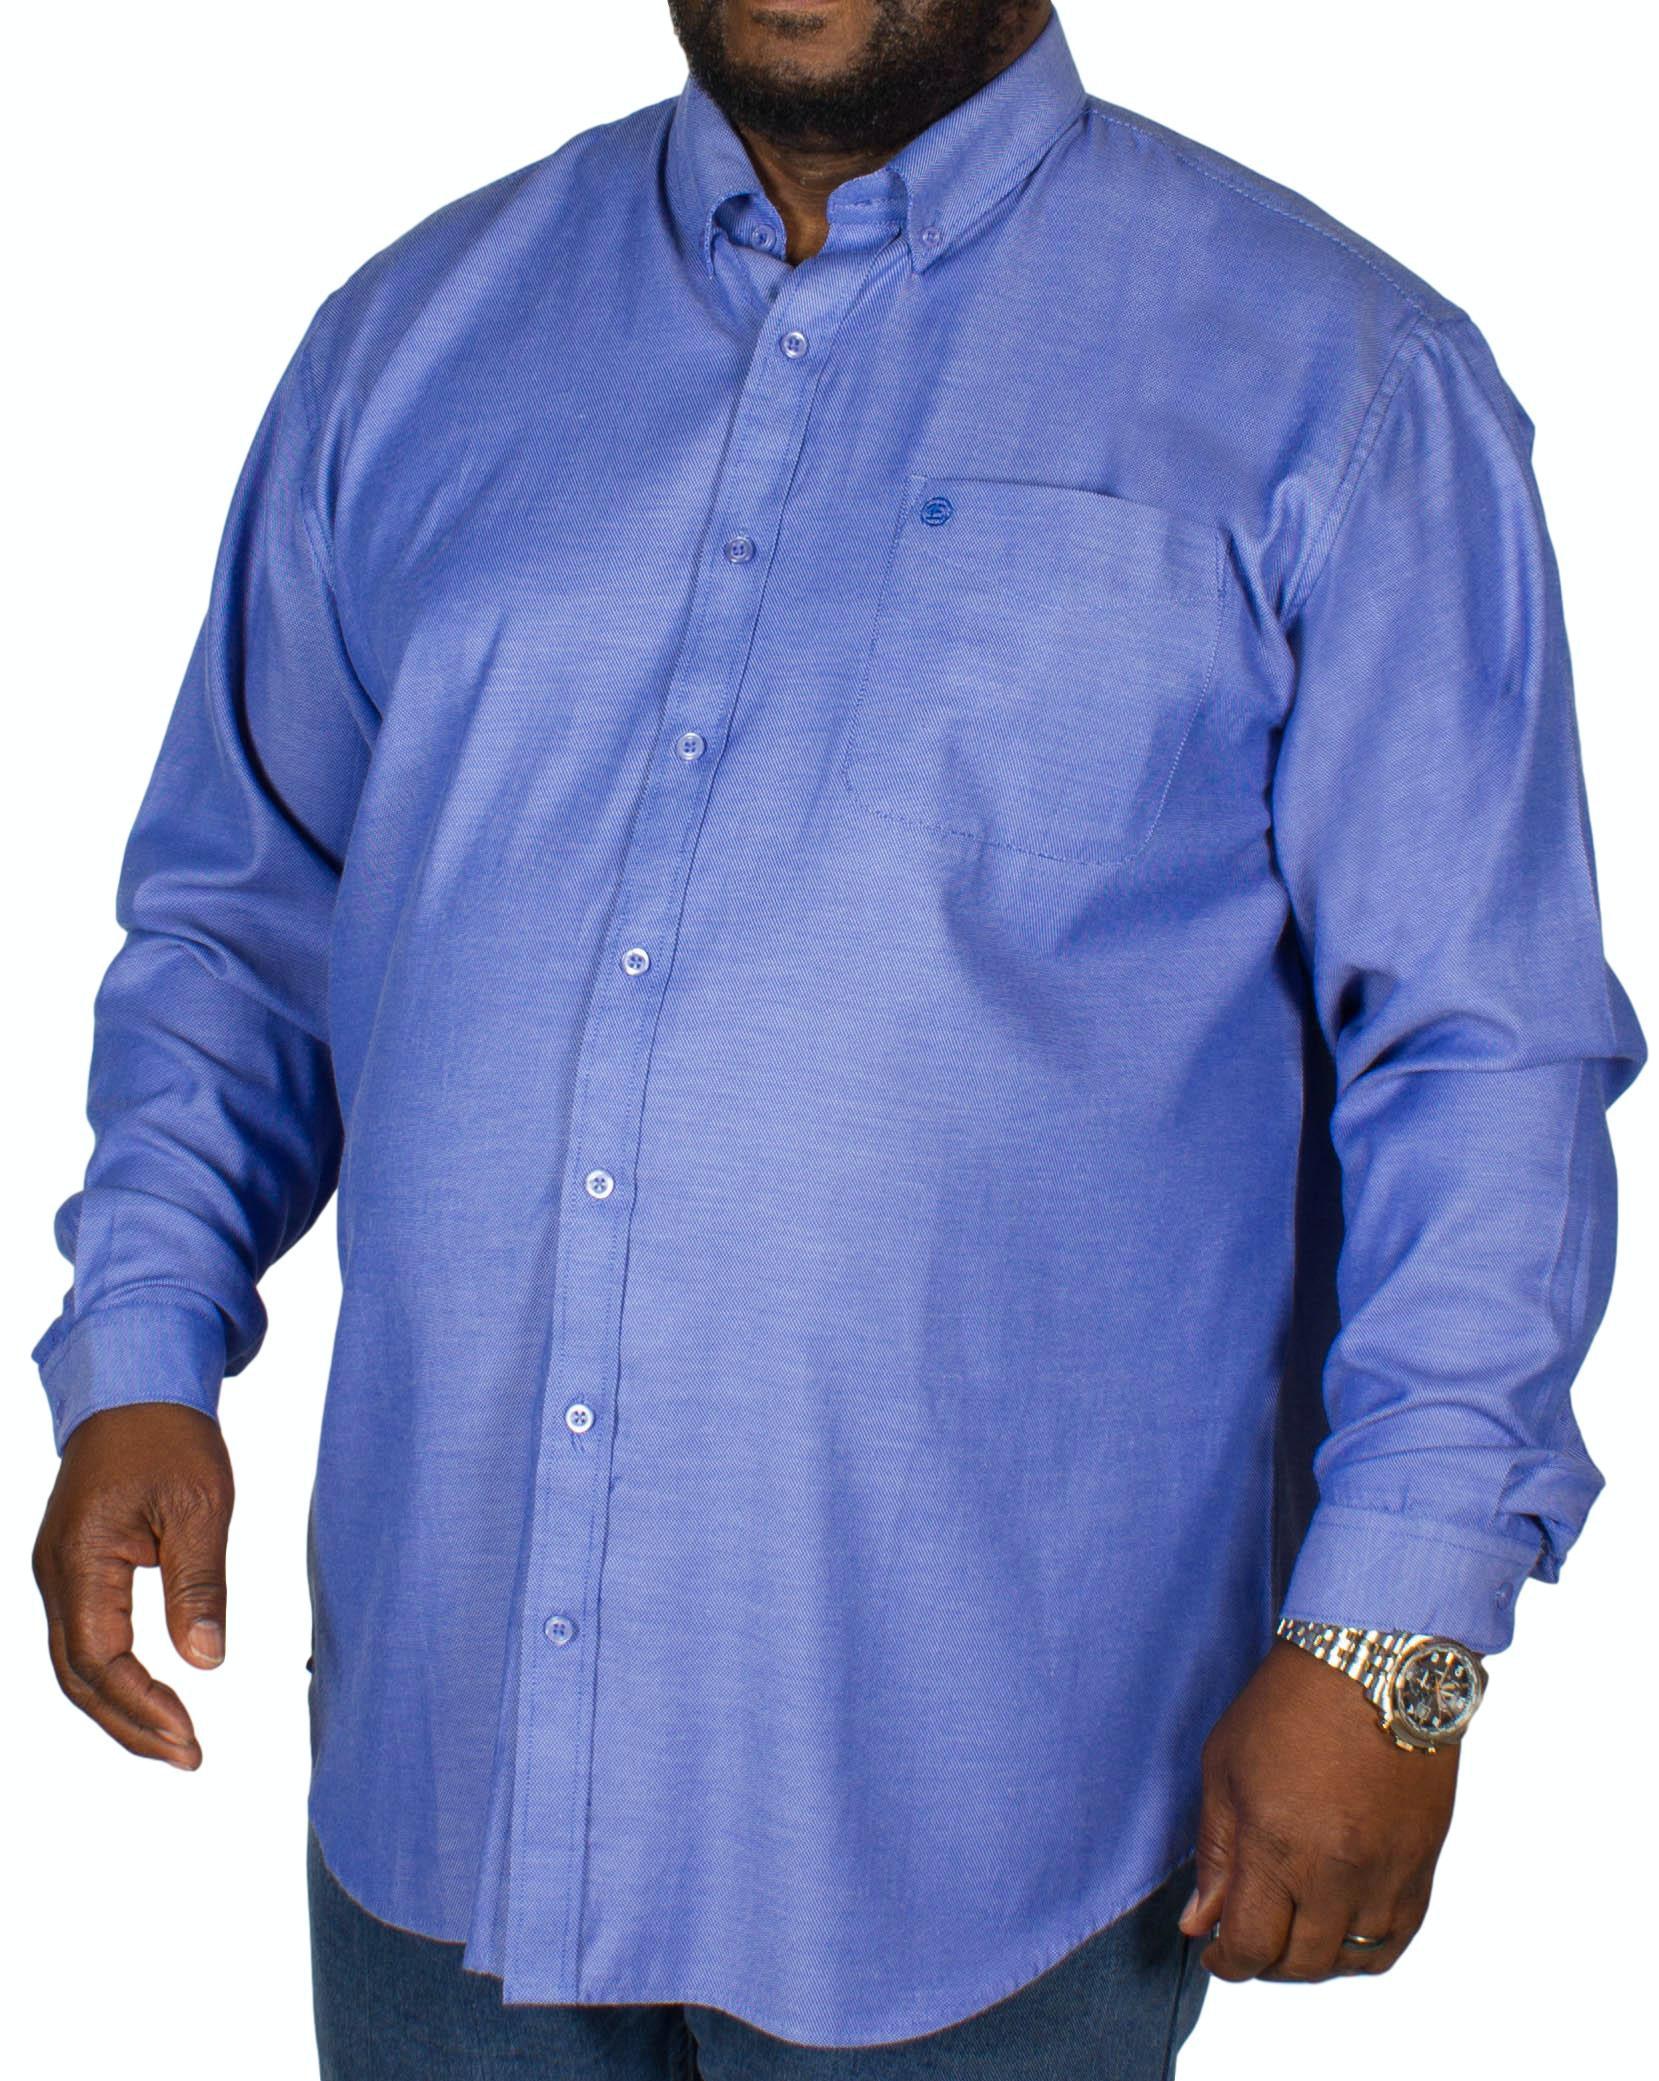 Espionage Oxford Long Sleeve Shirt Blue